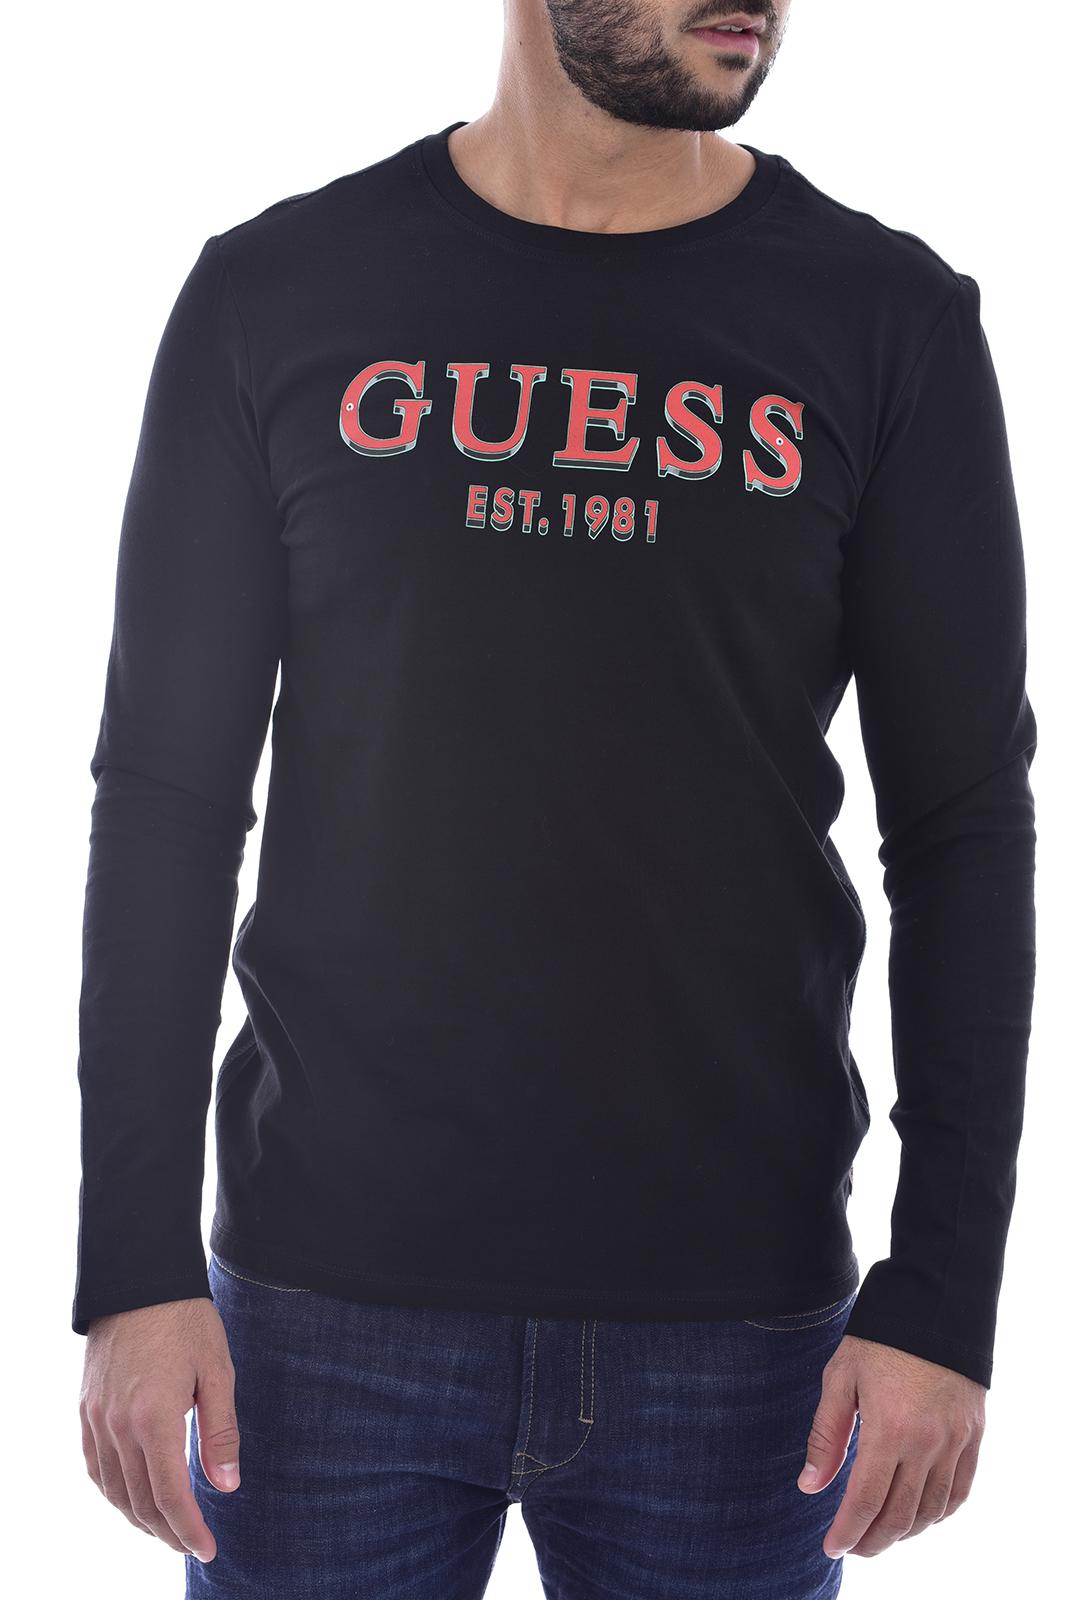 T-S manches longues  Guess jeans M0BI68 I3Z00 JBLK